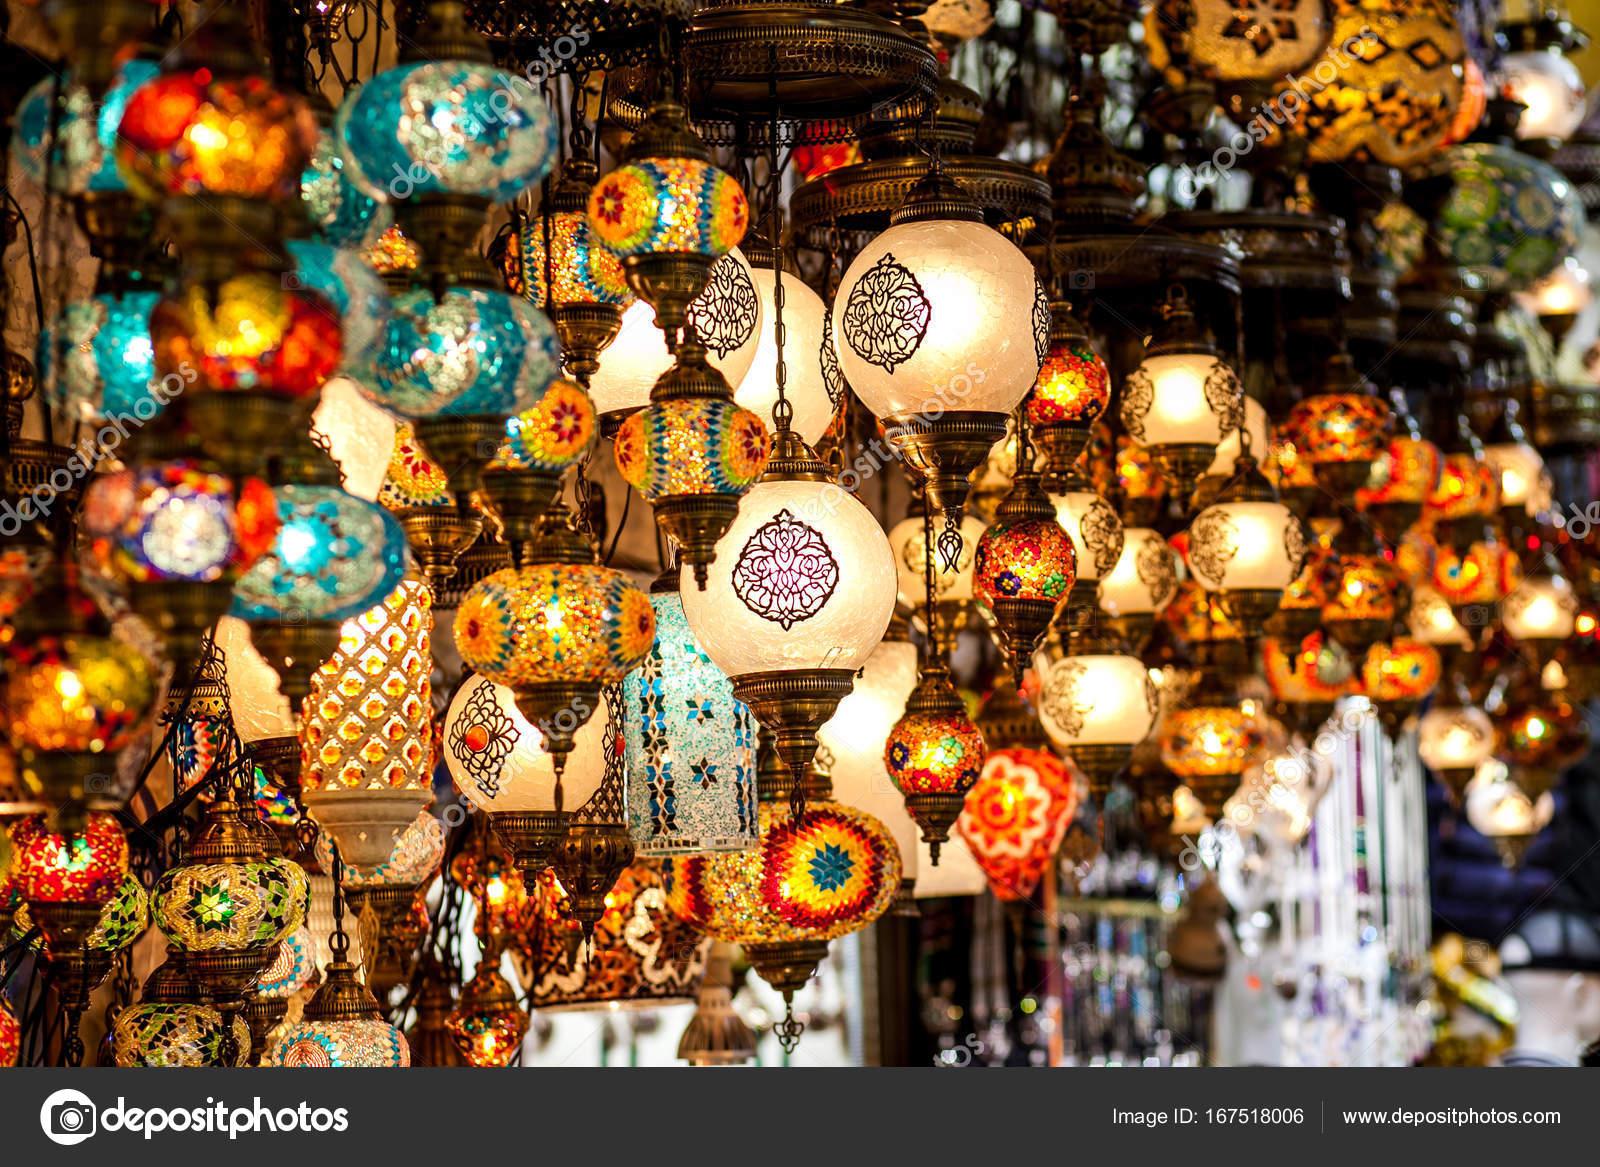 Lanterne Lampade Orientali Foto Stock C A Ostankova 167518006